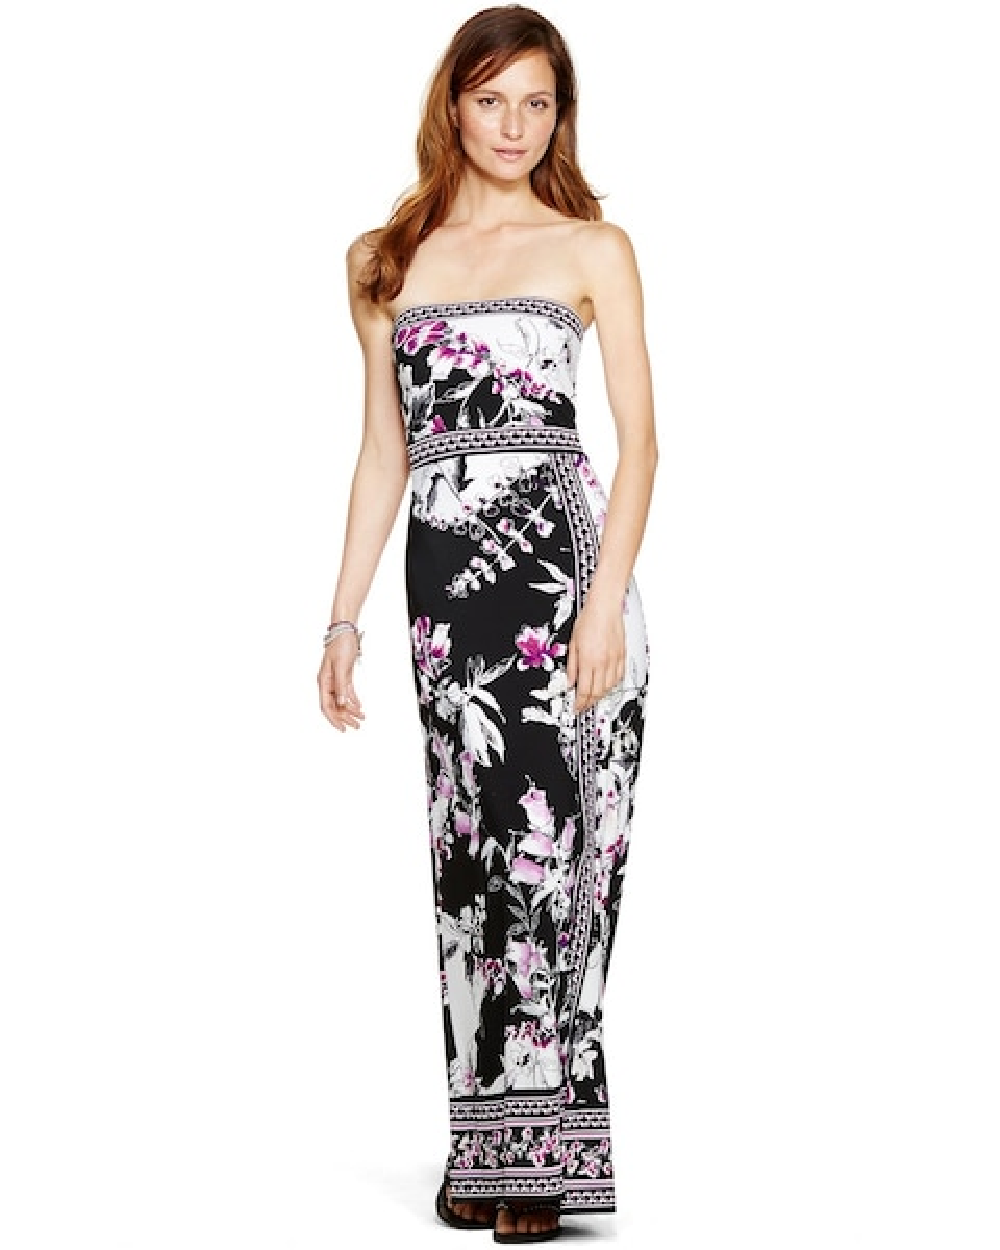 Strapless Floral Print Maxi Dress White House Black Market